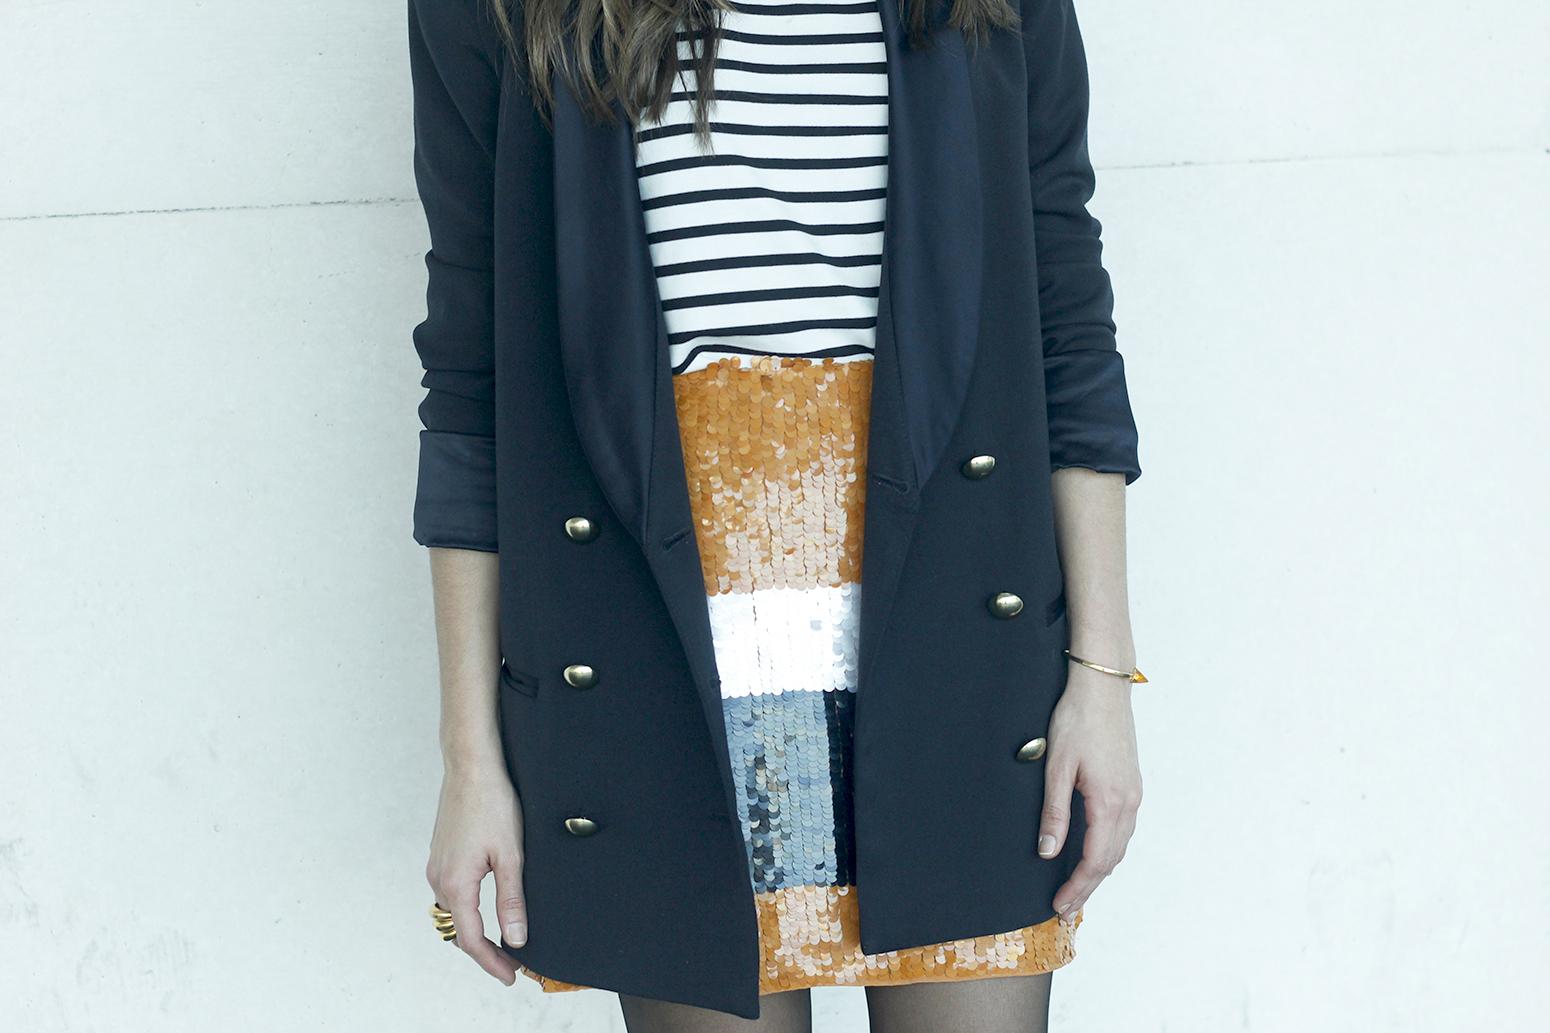 Striped T-Shirt Sequin skirt black blazer madrid fashion week street style fashion outfit04.jpg02